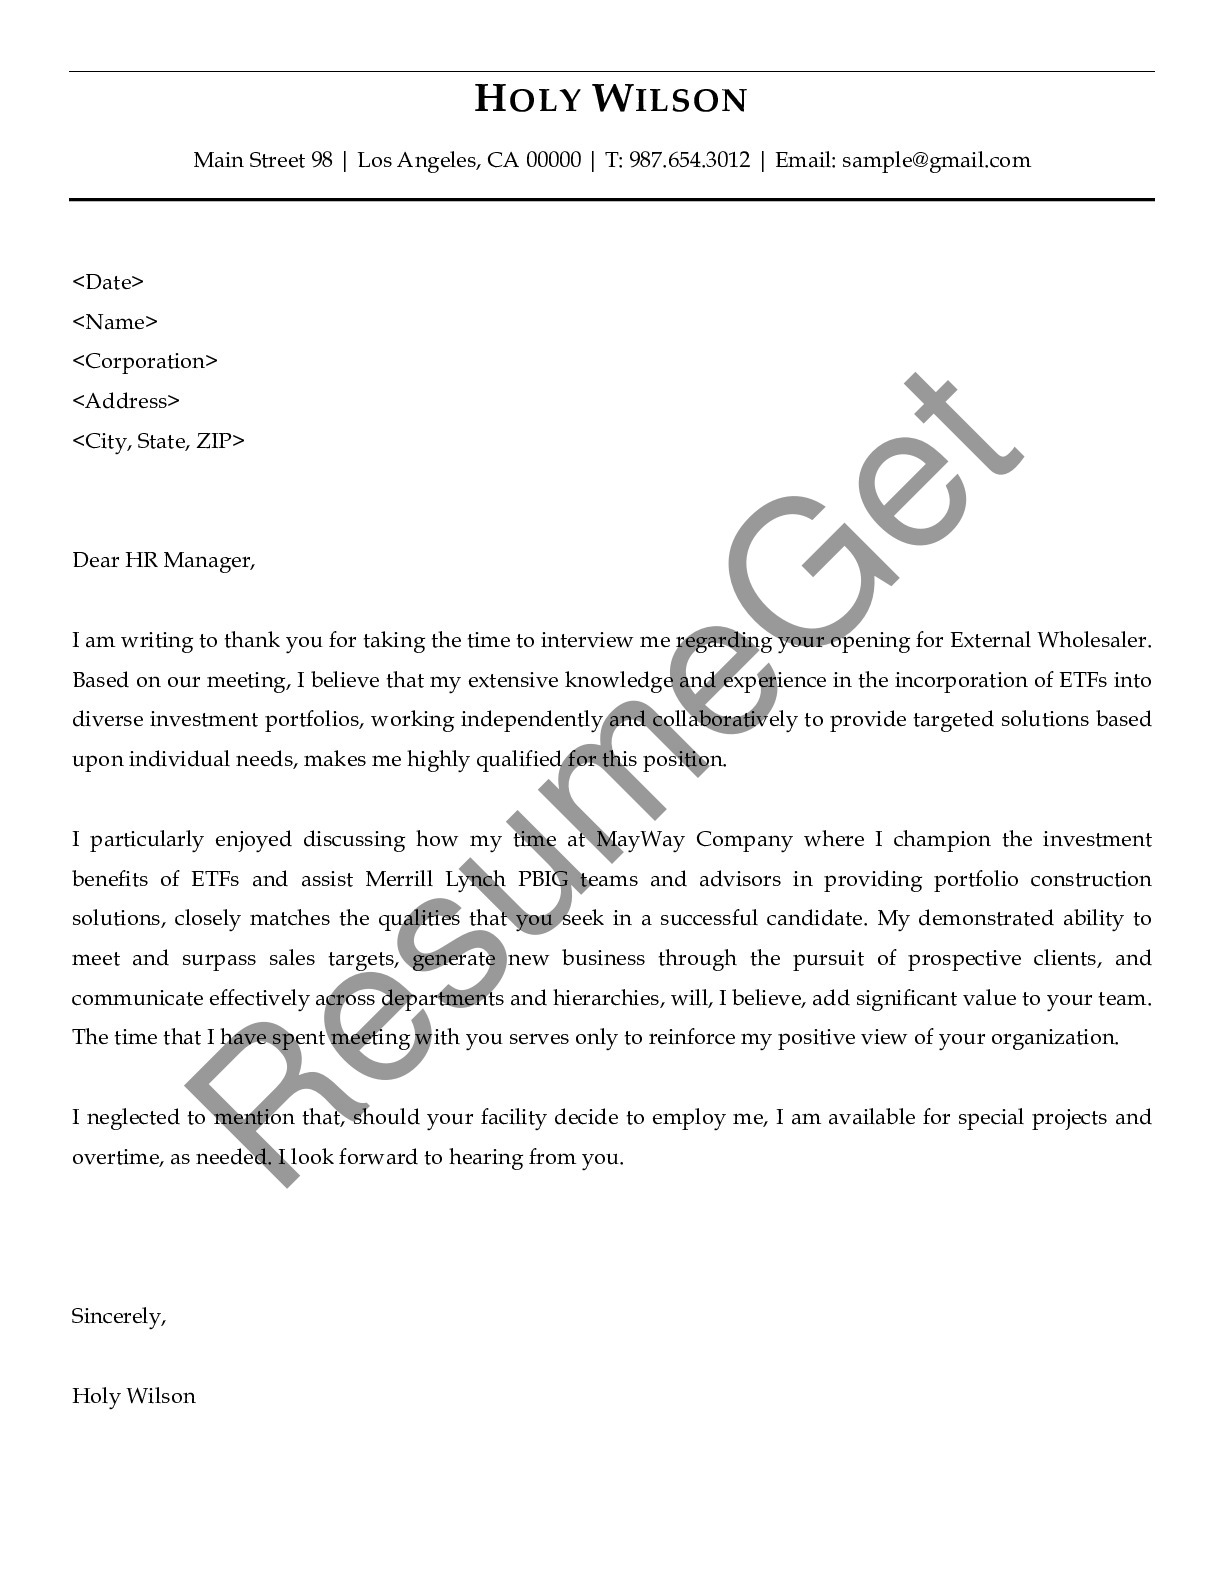 Thank You Letter for External Wholesaler